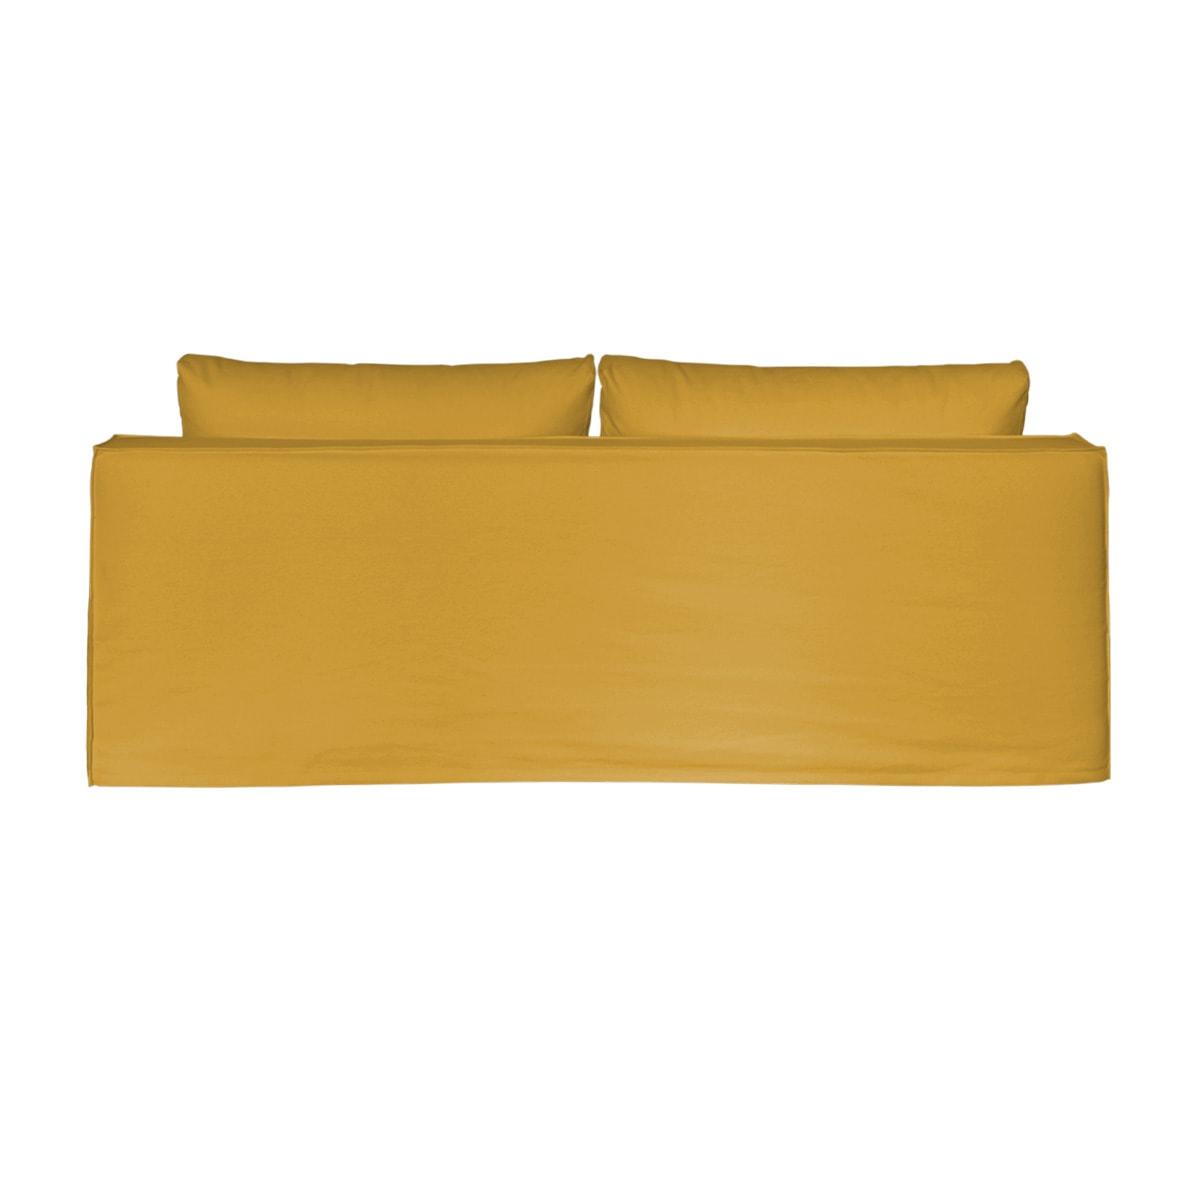 Sofa Dois Lugares Futon Company